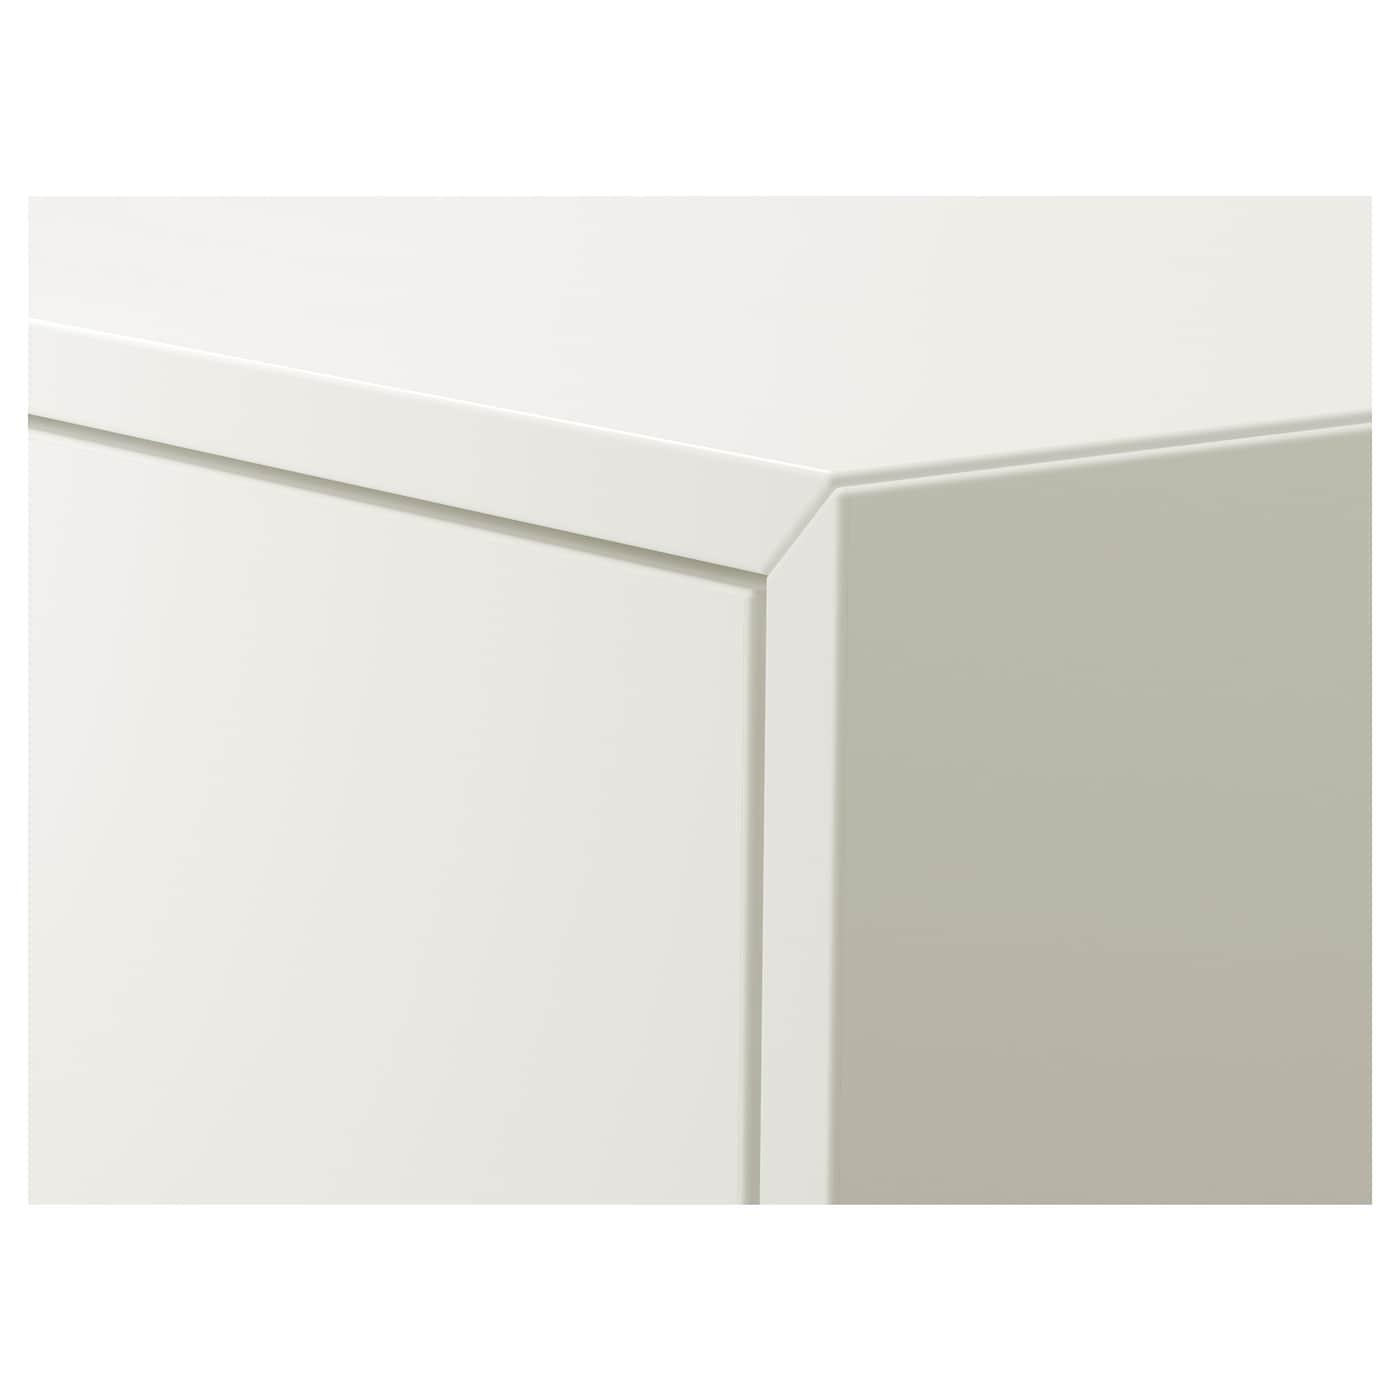 EKET Skåp med 2 lådor, vit, 70x35x35 cm